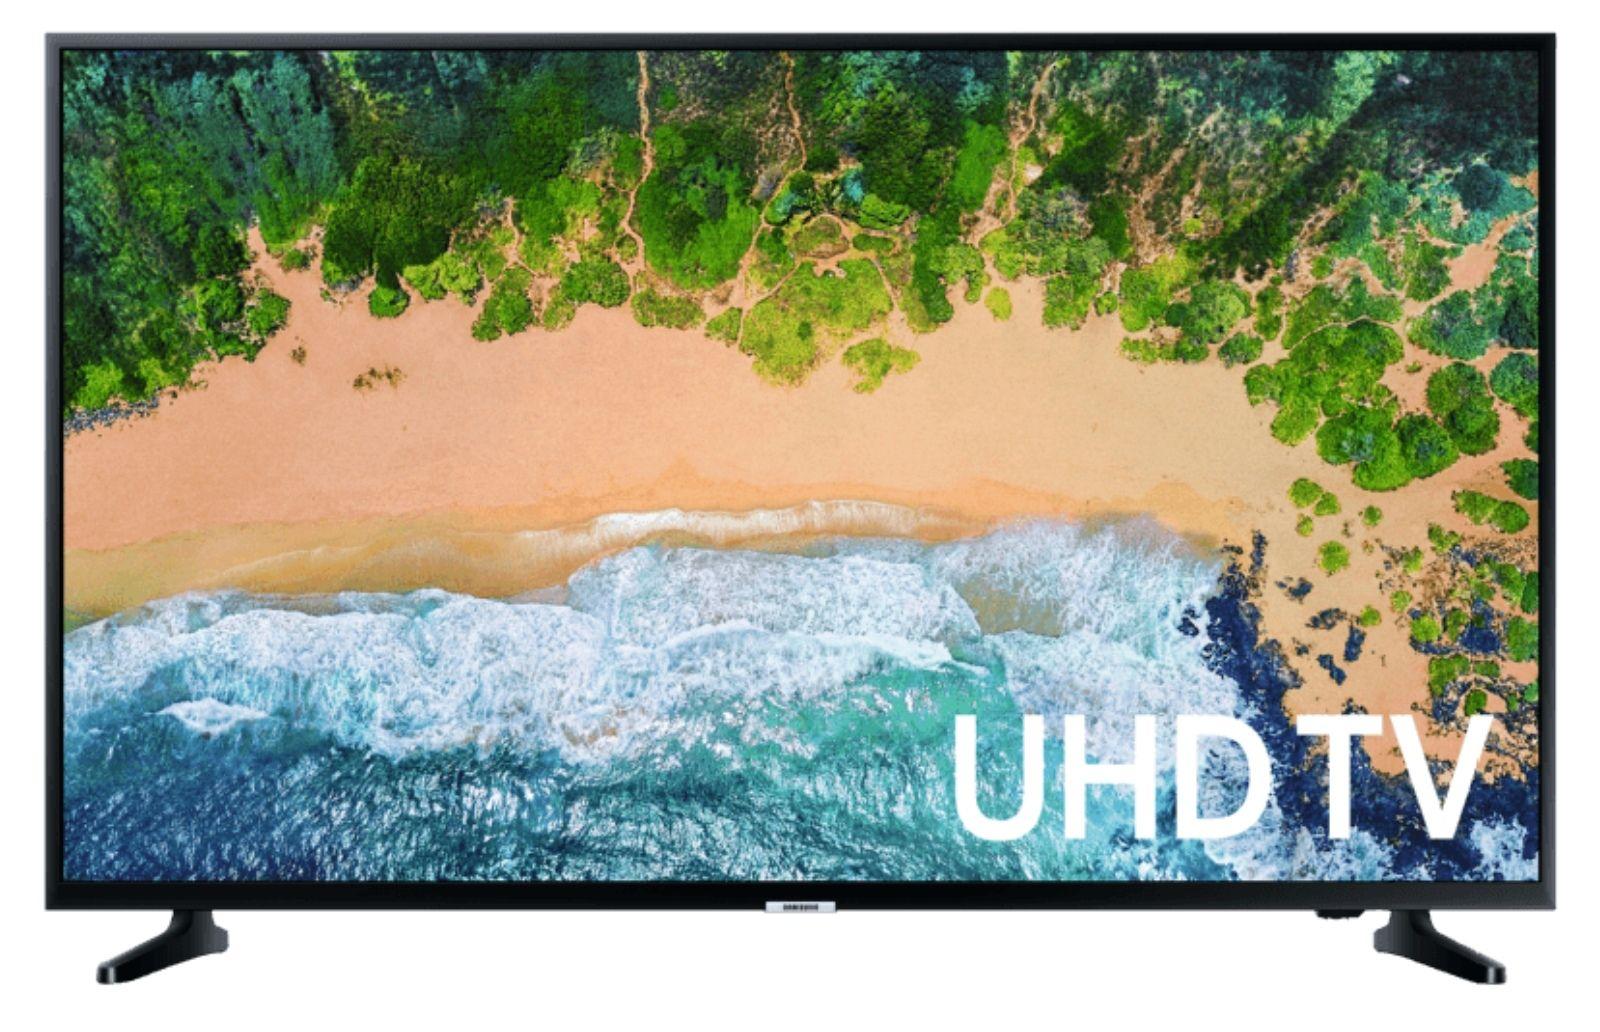 SAMSUNG UE65NU7099, 163 cm (65 Zoll), UHD 4K, SMART TV, LED TV, 1300 PQI, DVB-T2 HD, DVB-C, DVB-S, DVB-S2 [mit Shoop ~690€]